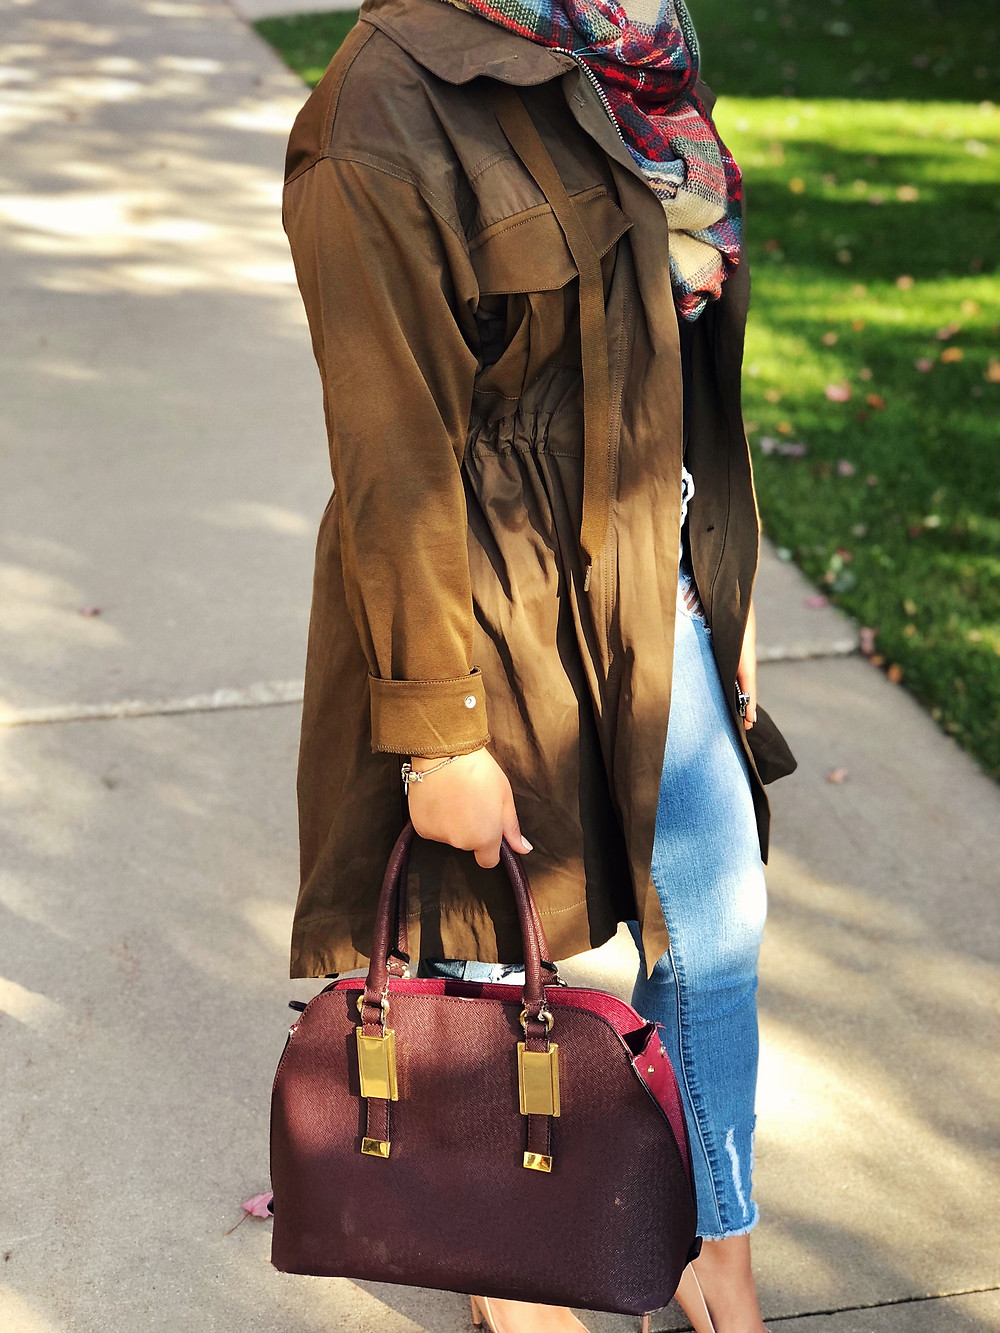 Oversized Jacket with adjustable strings on waistband.